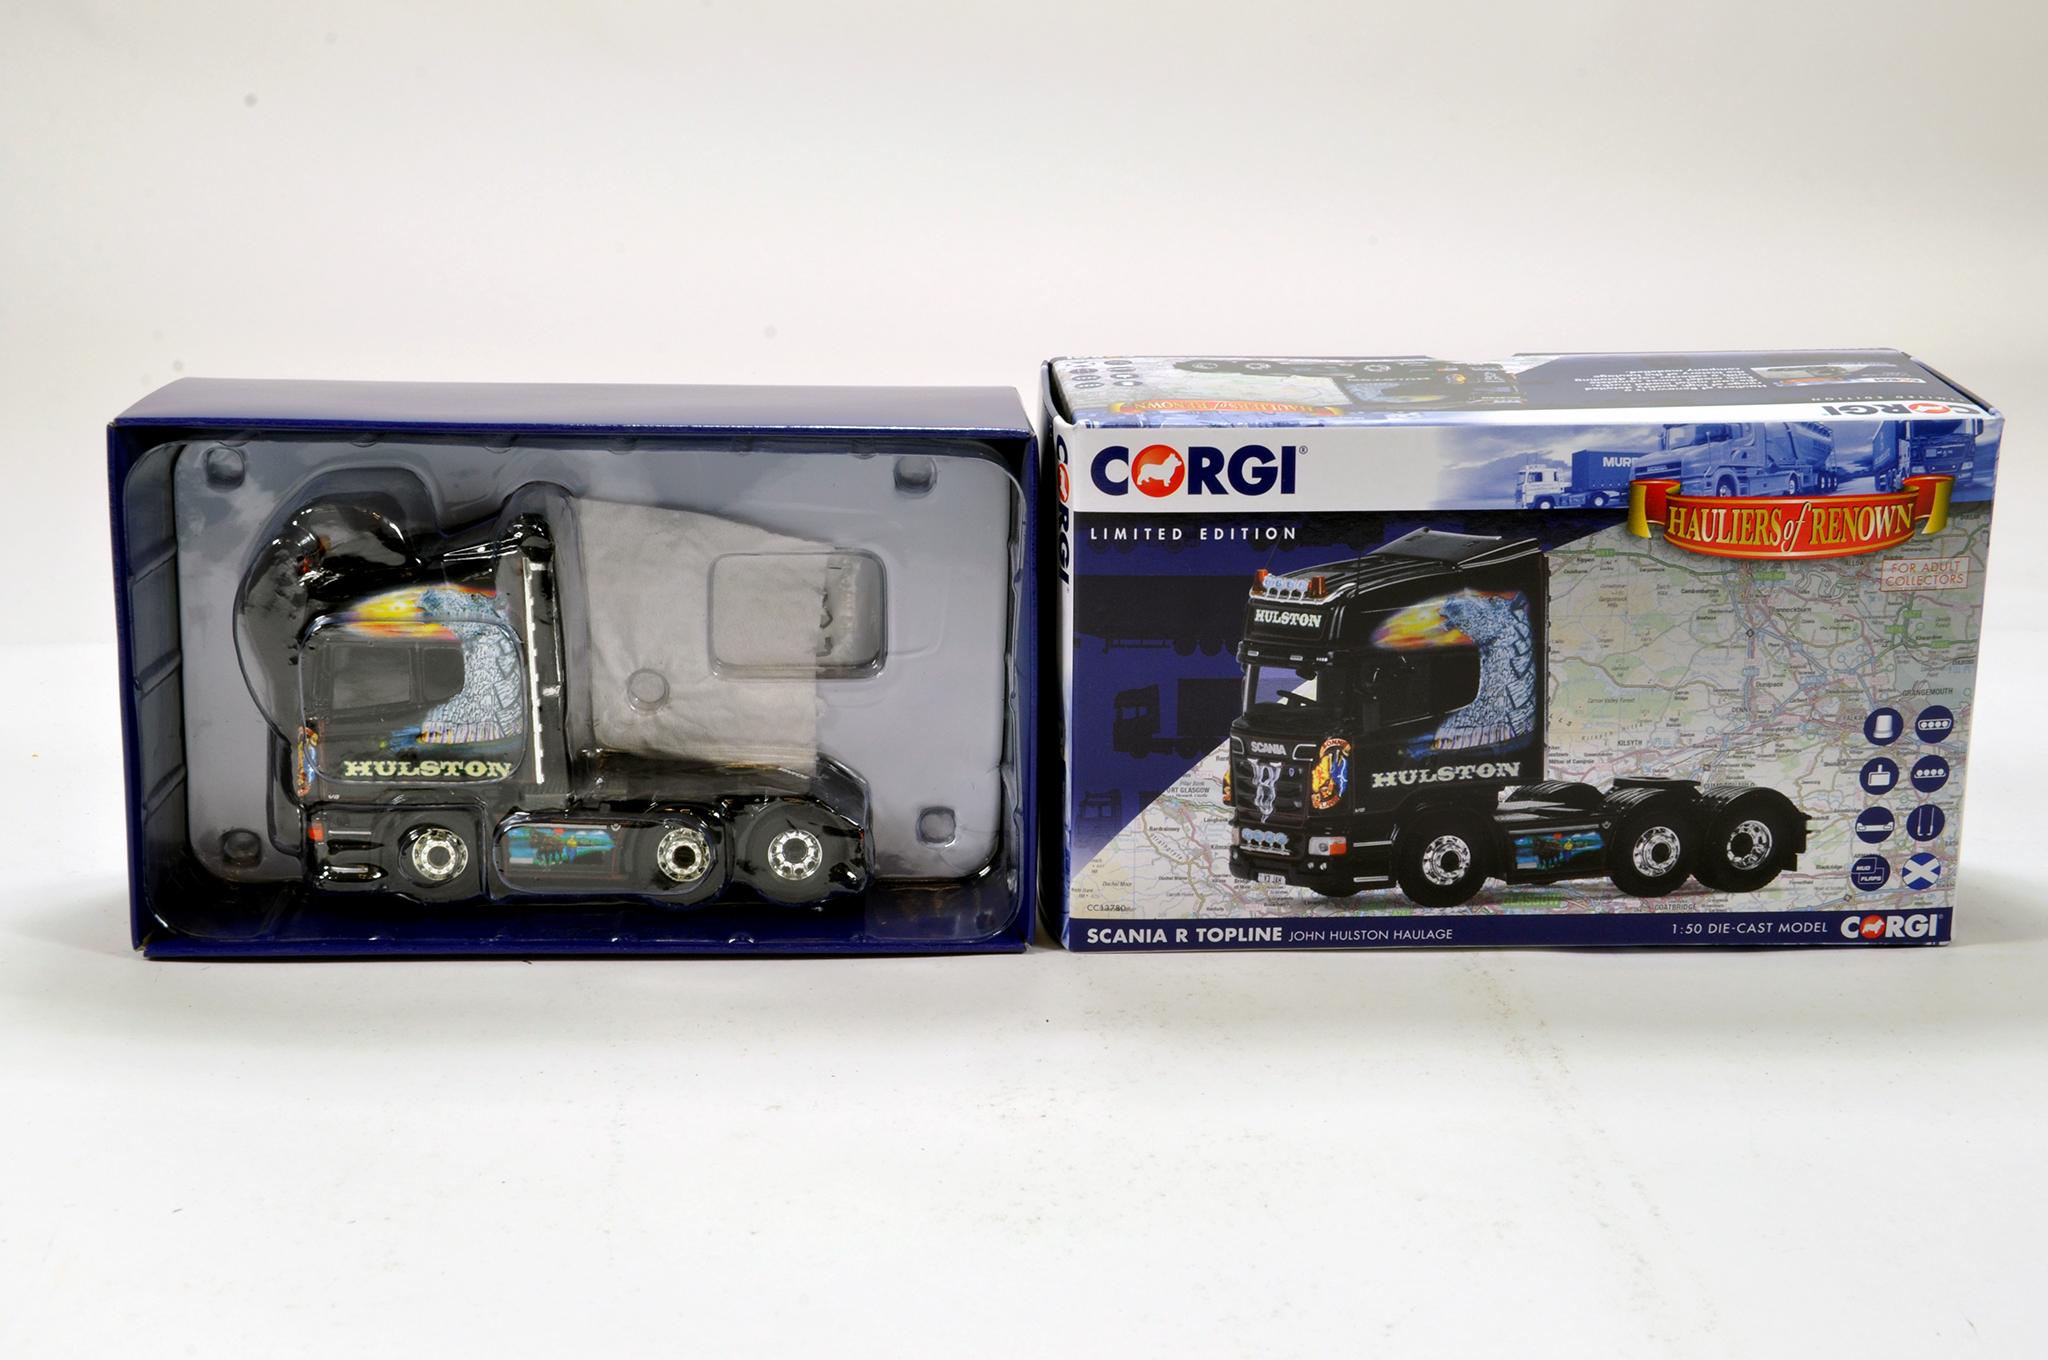 Lot 60 - Corgi 1/50 diecast truck issue comprising No. CC13780 Scania R Topline in livery of John Hulston.